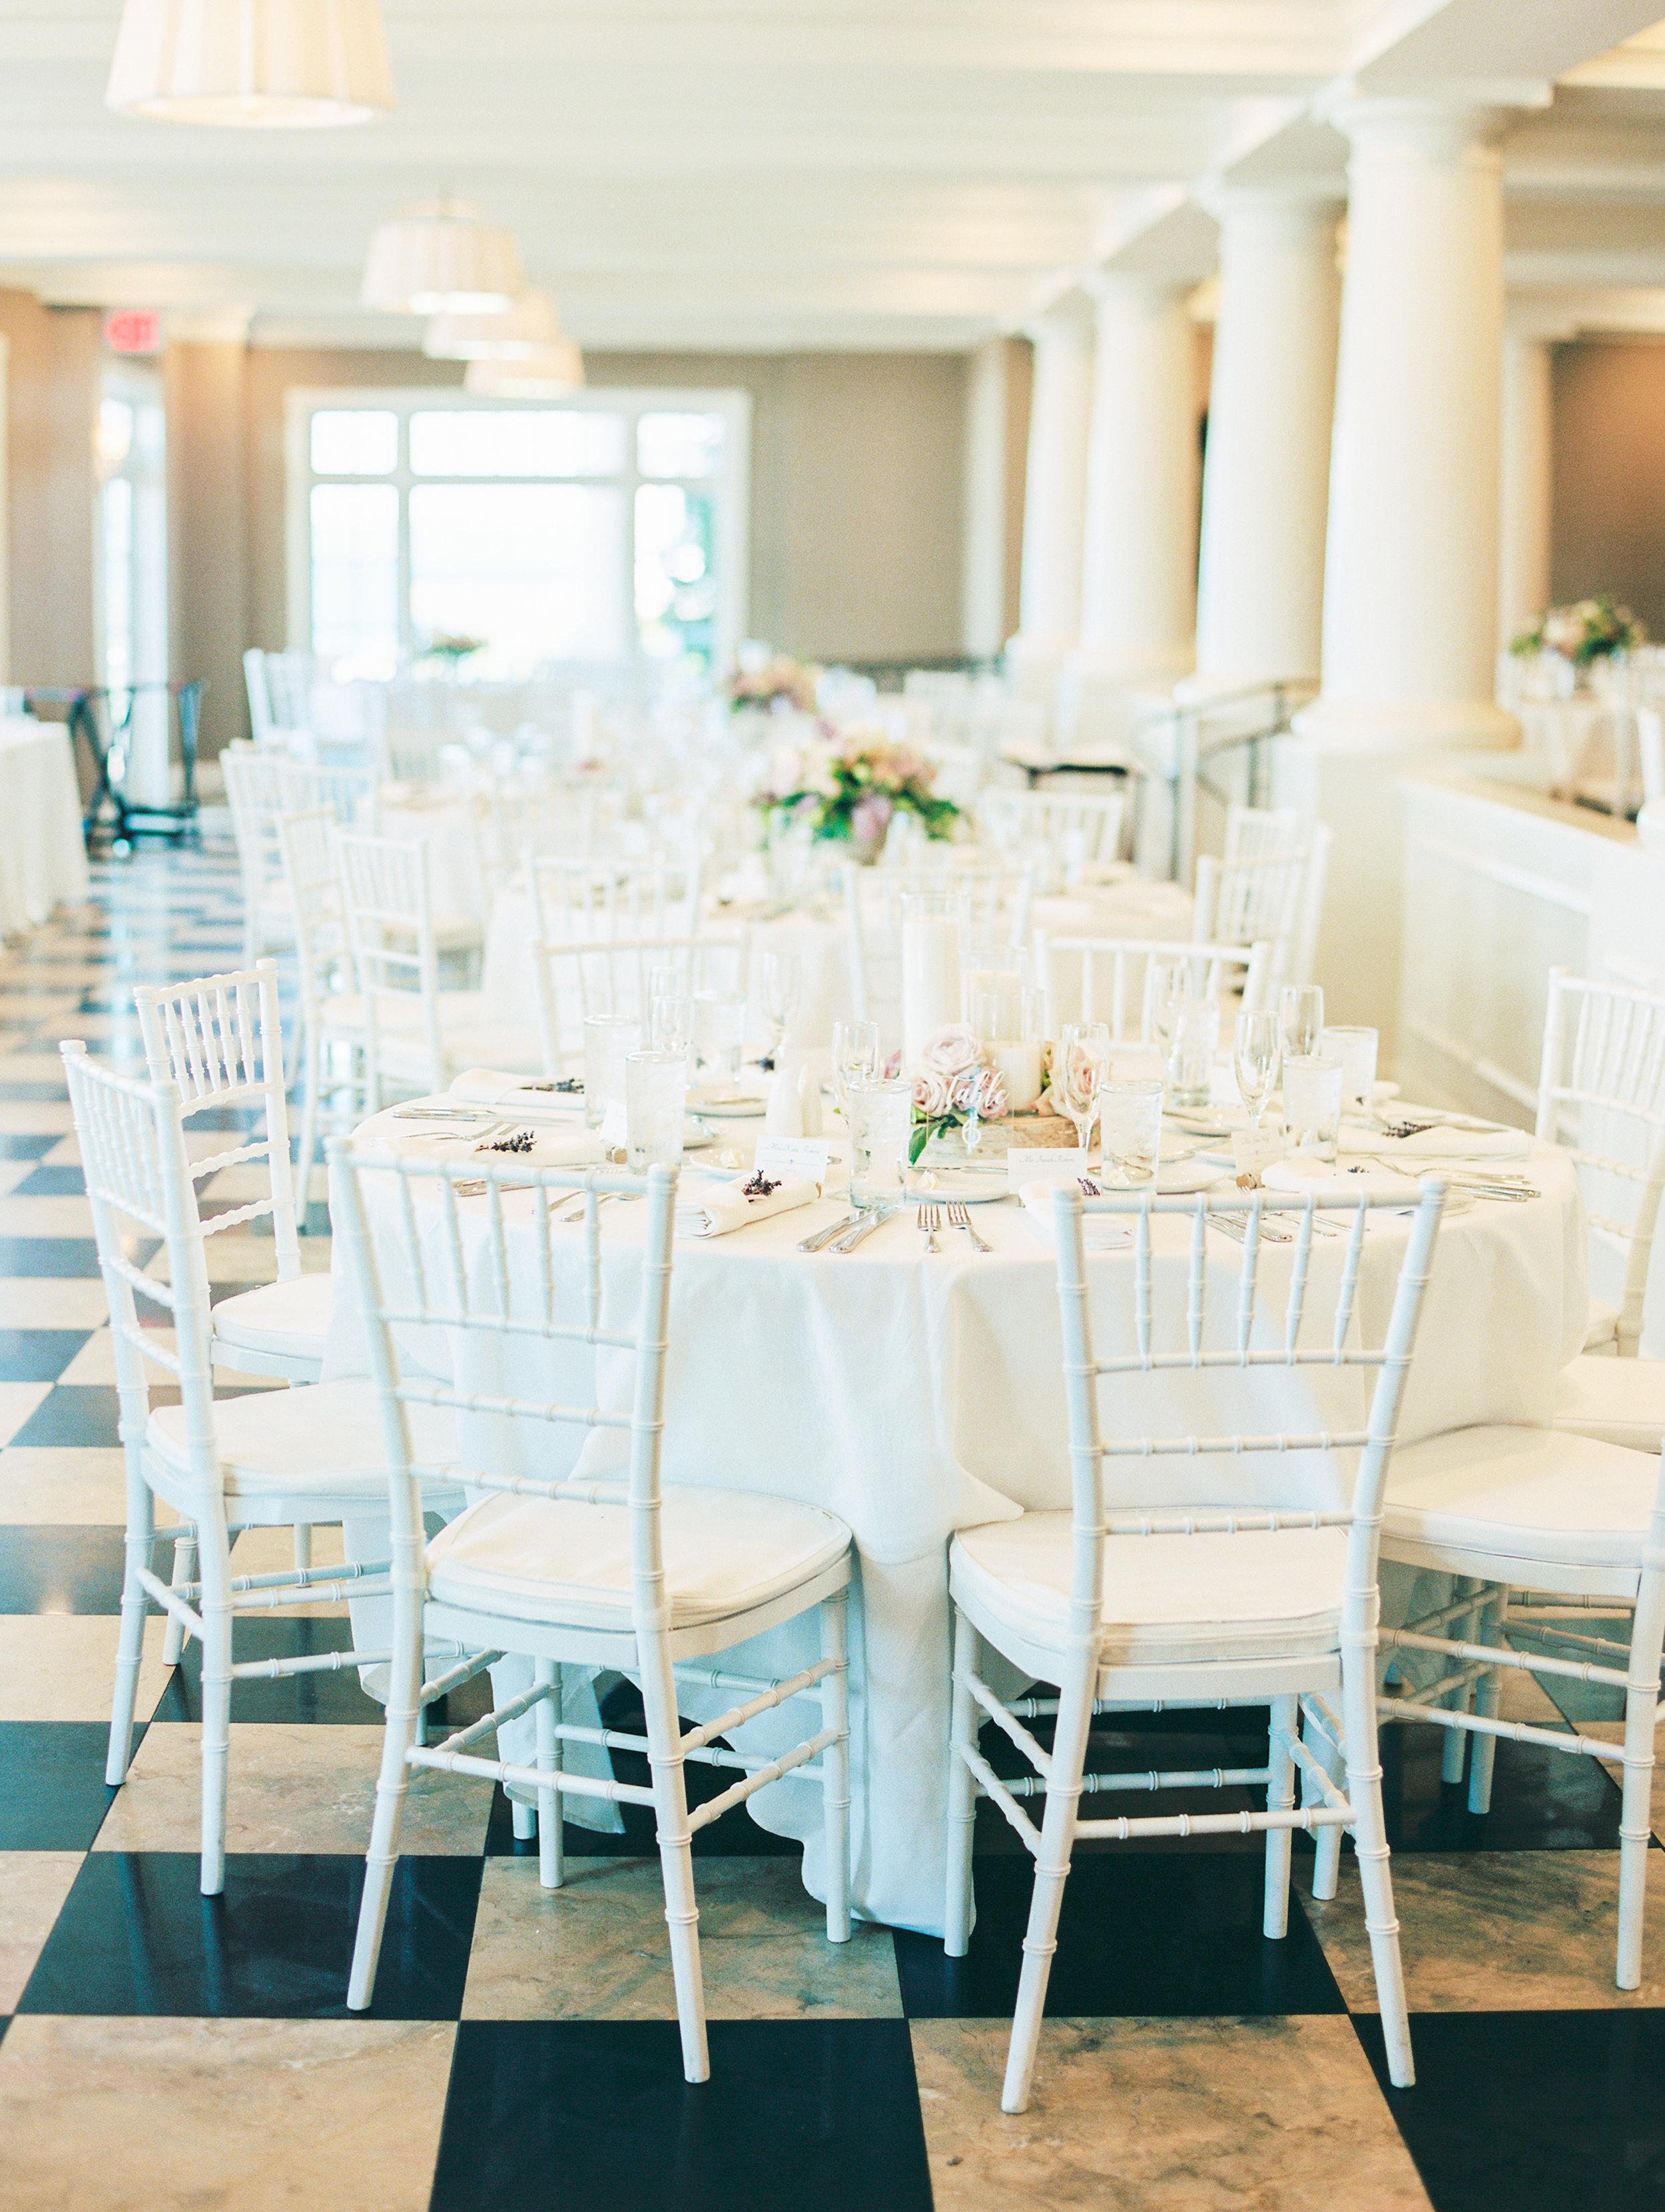 Noss+Wedding+Reception+Details-42.jpg